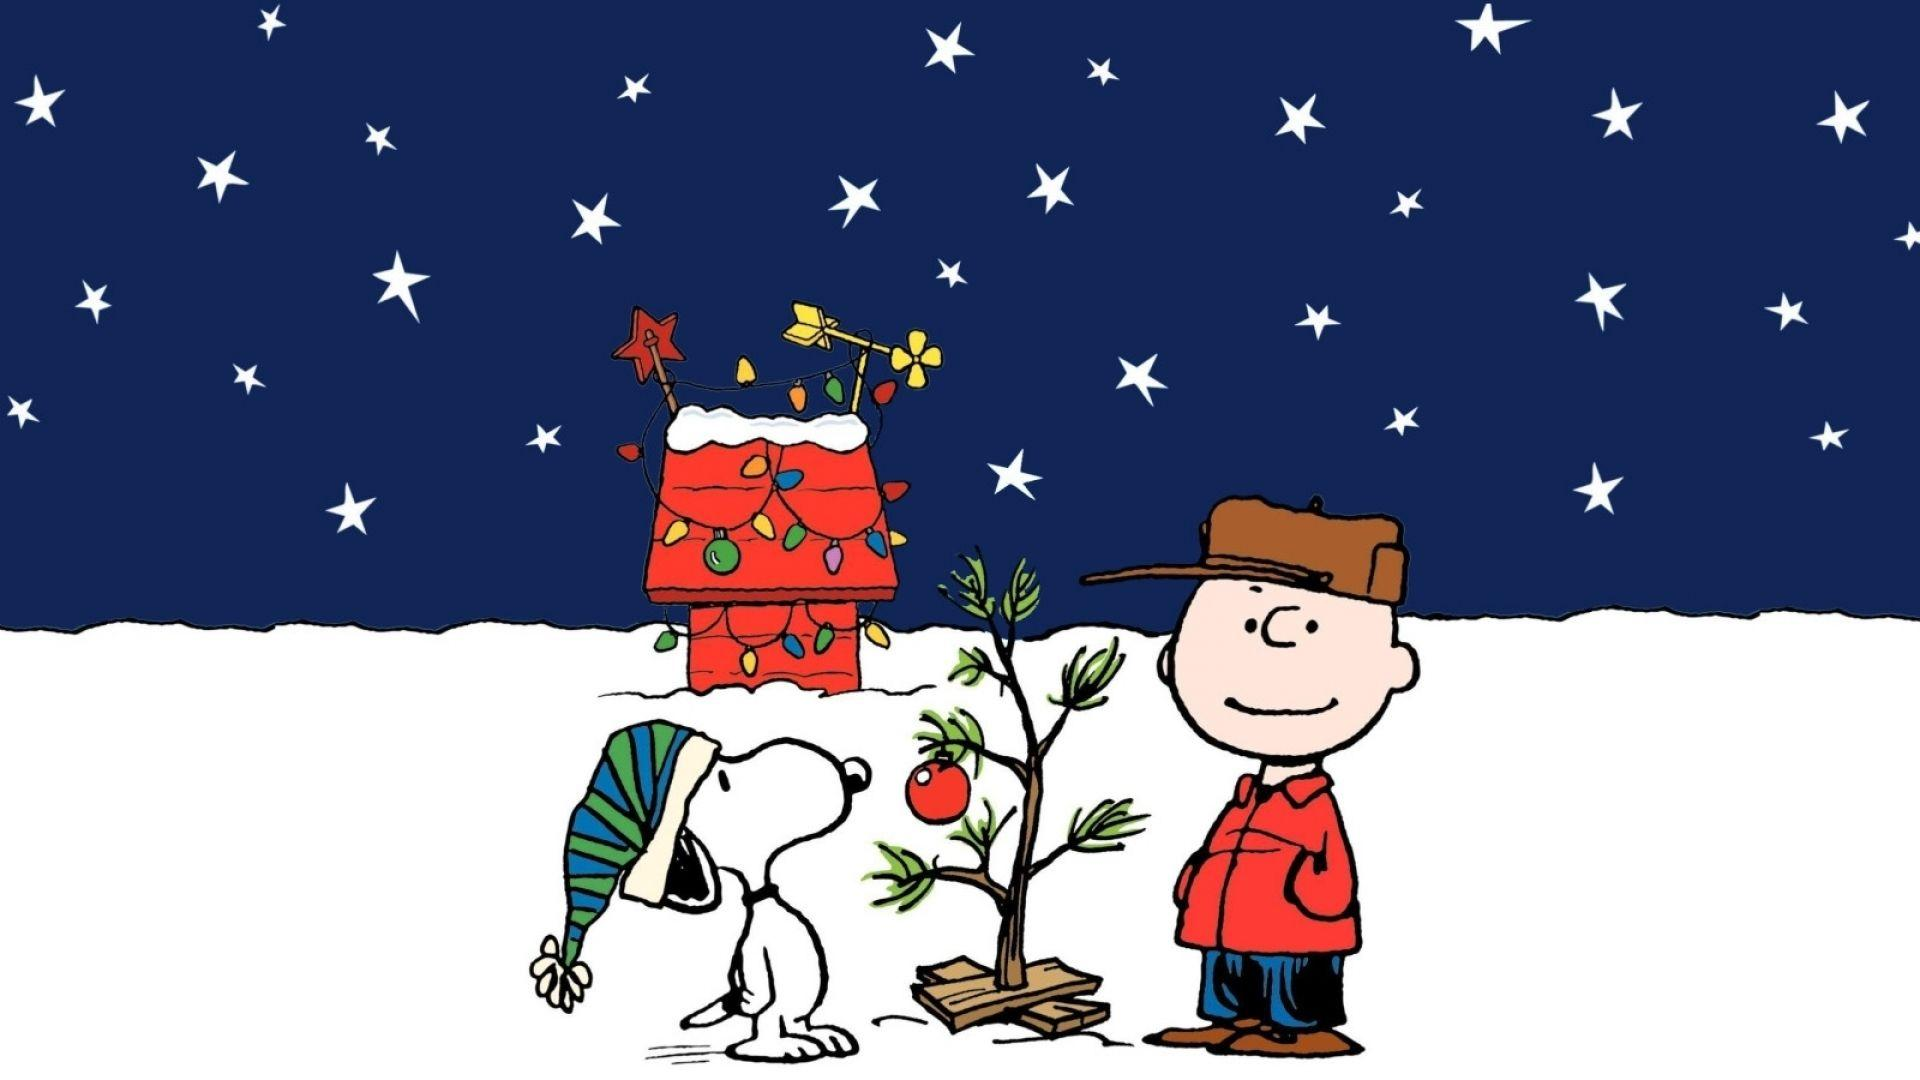 Christmas Cartoon Wallpaper Tumblr